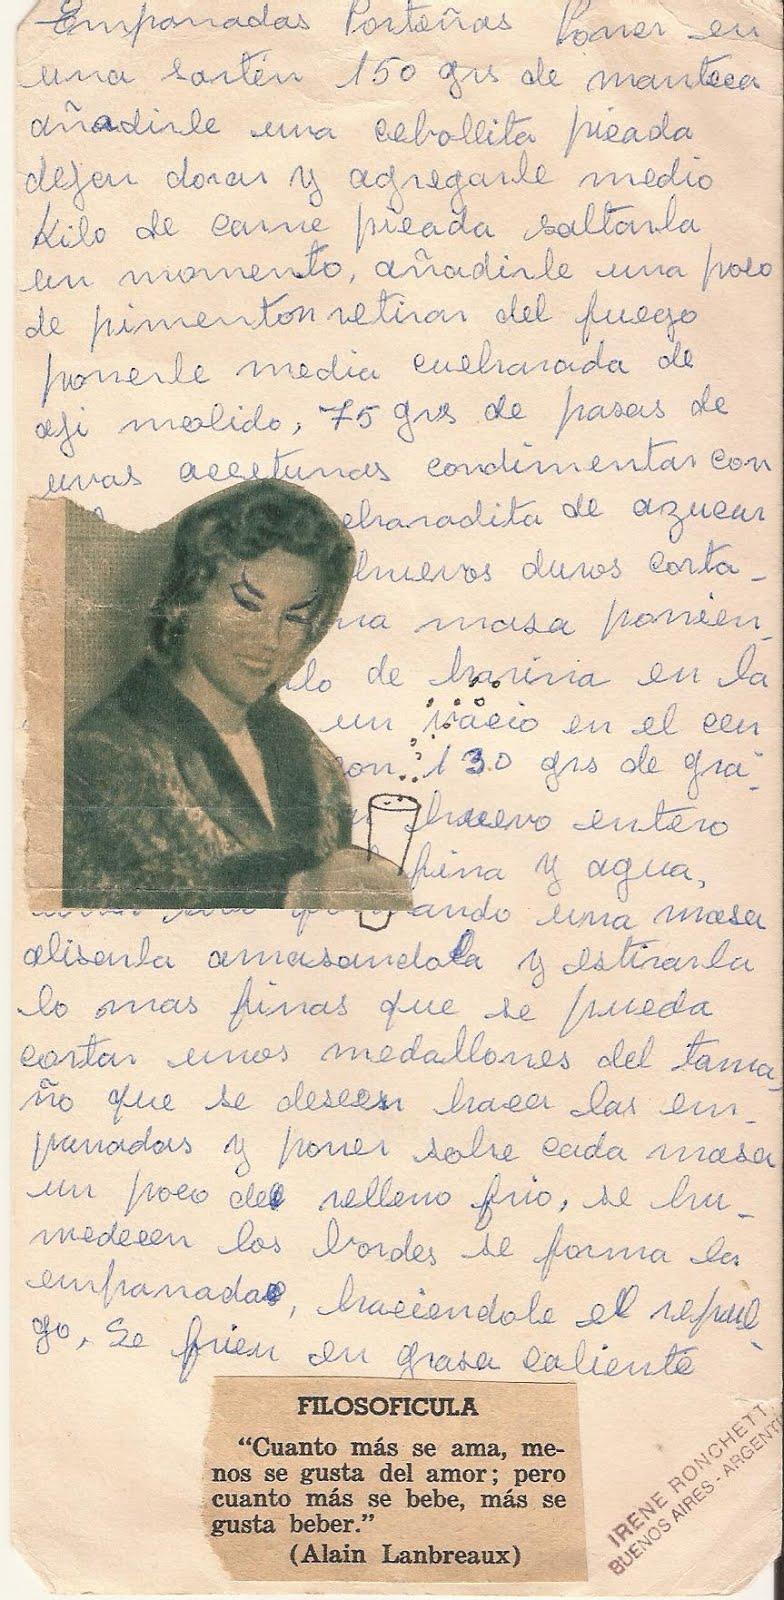 Irene Ronchetti - Argentina